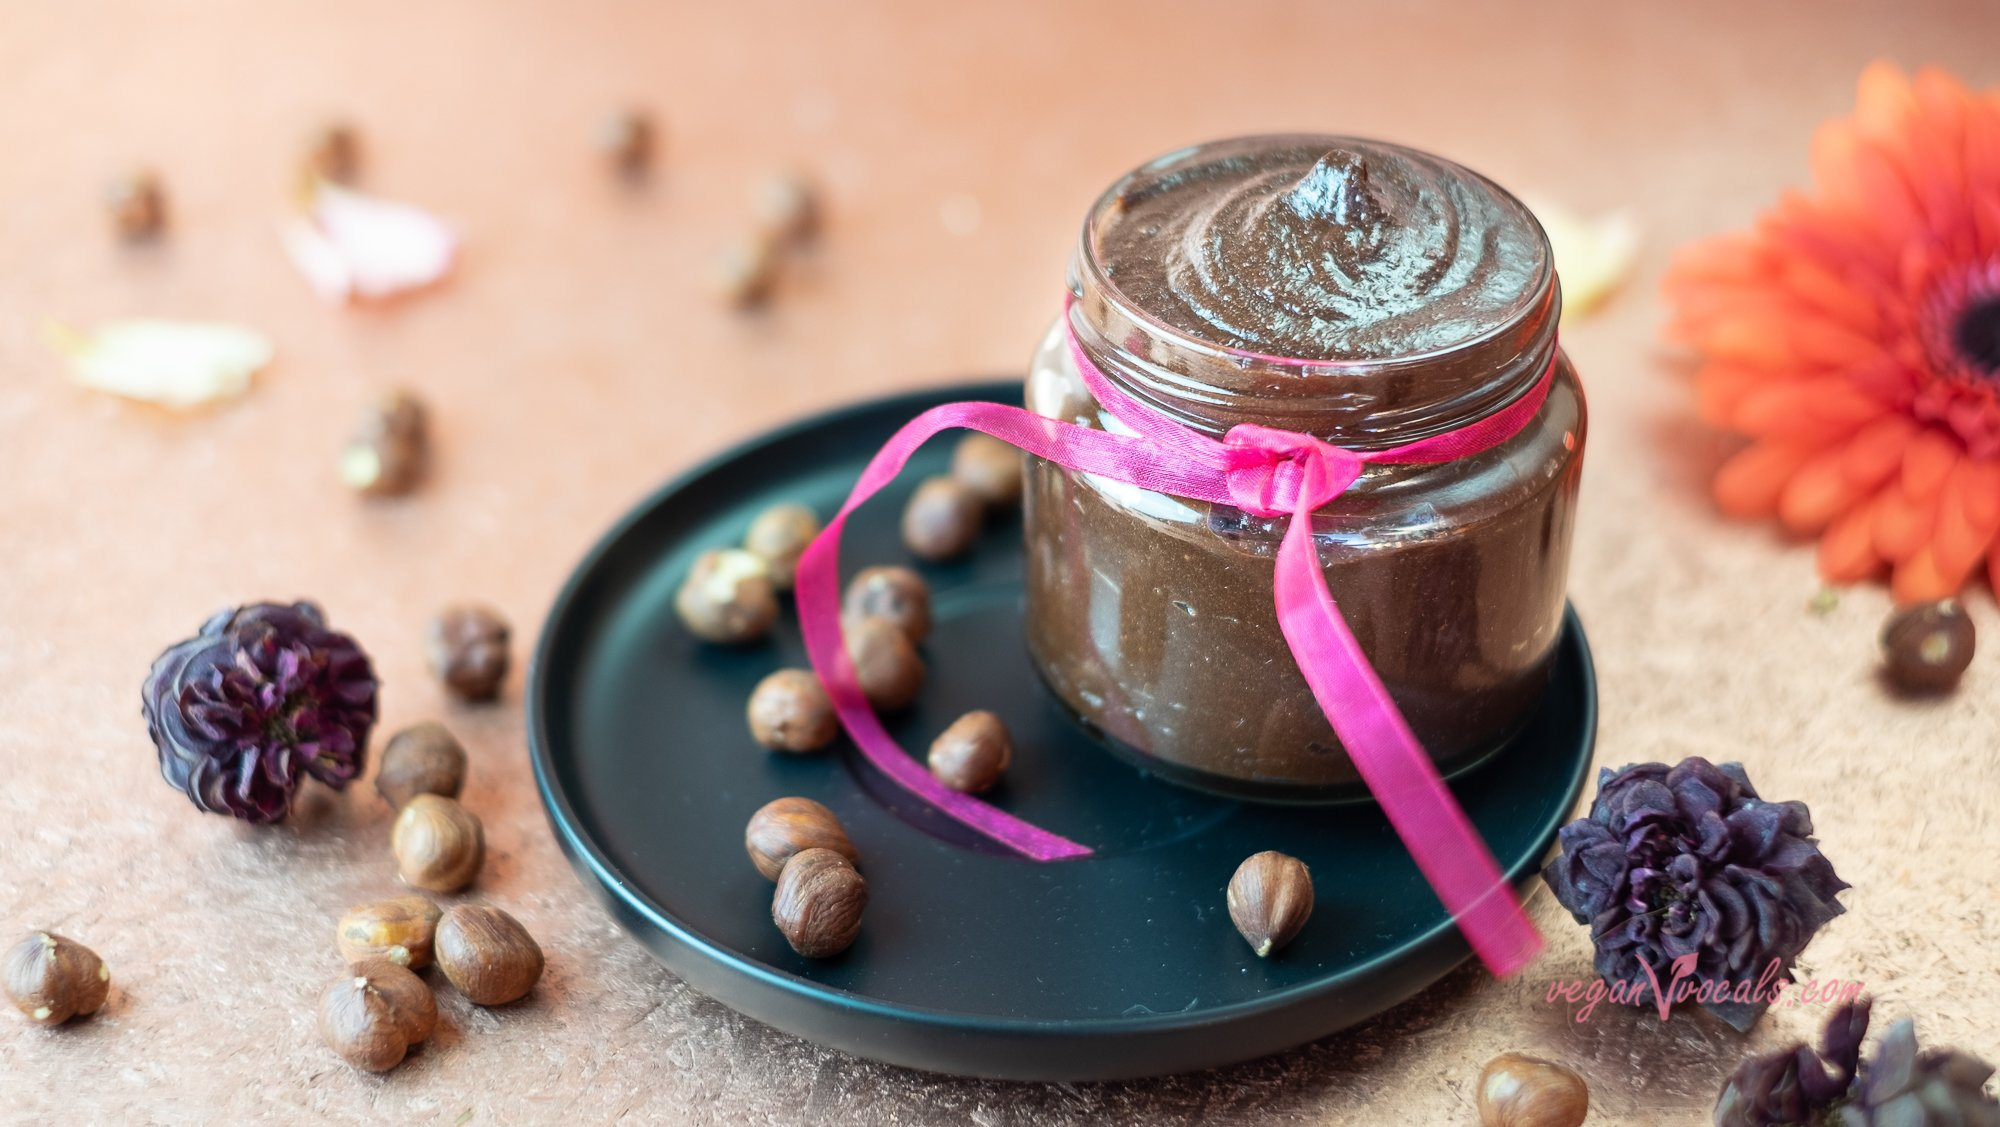 The Best Homemade Vegan Nutella